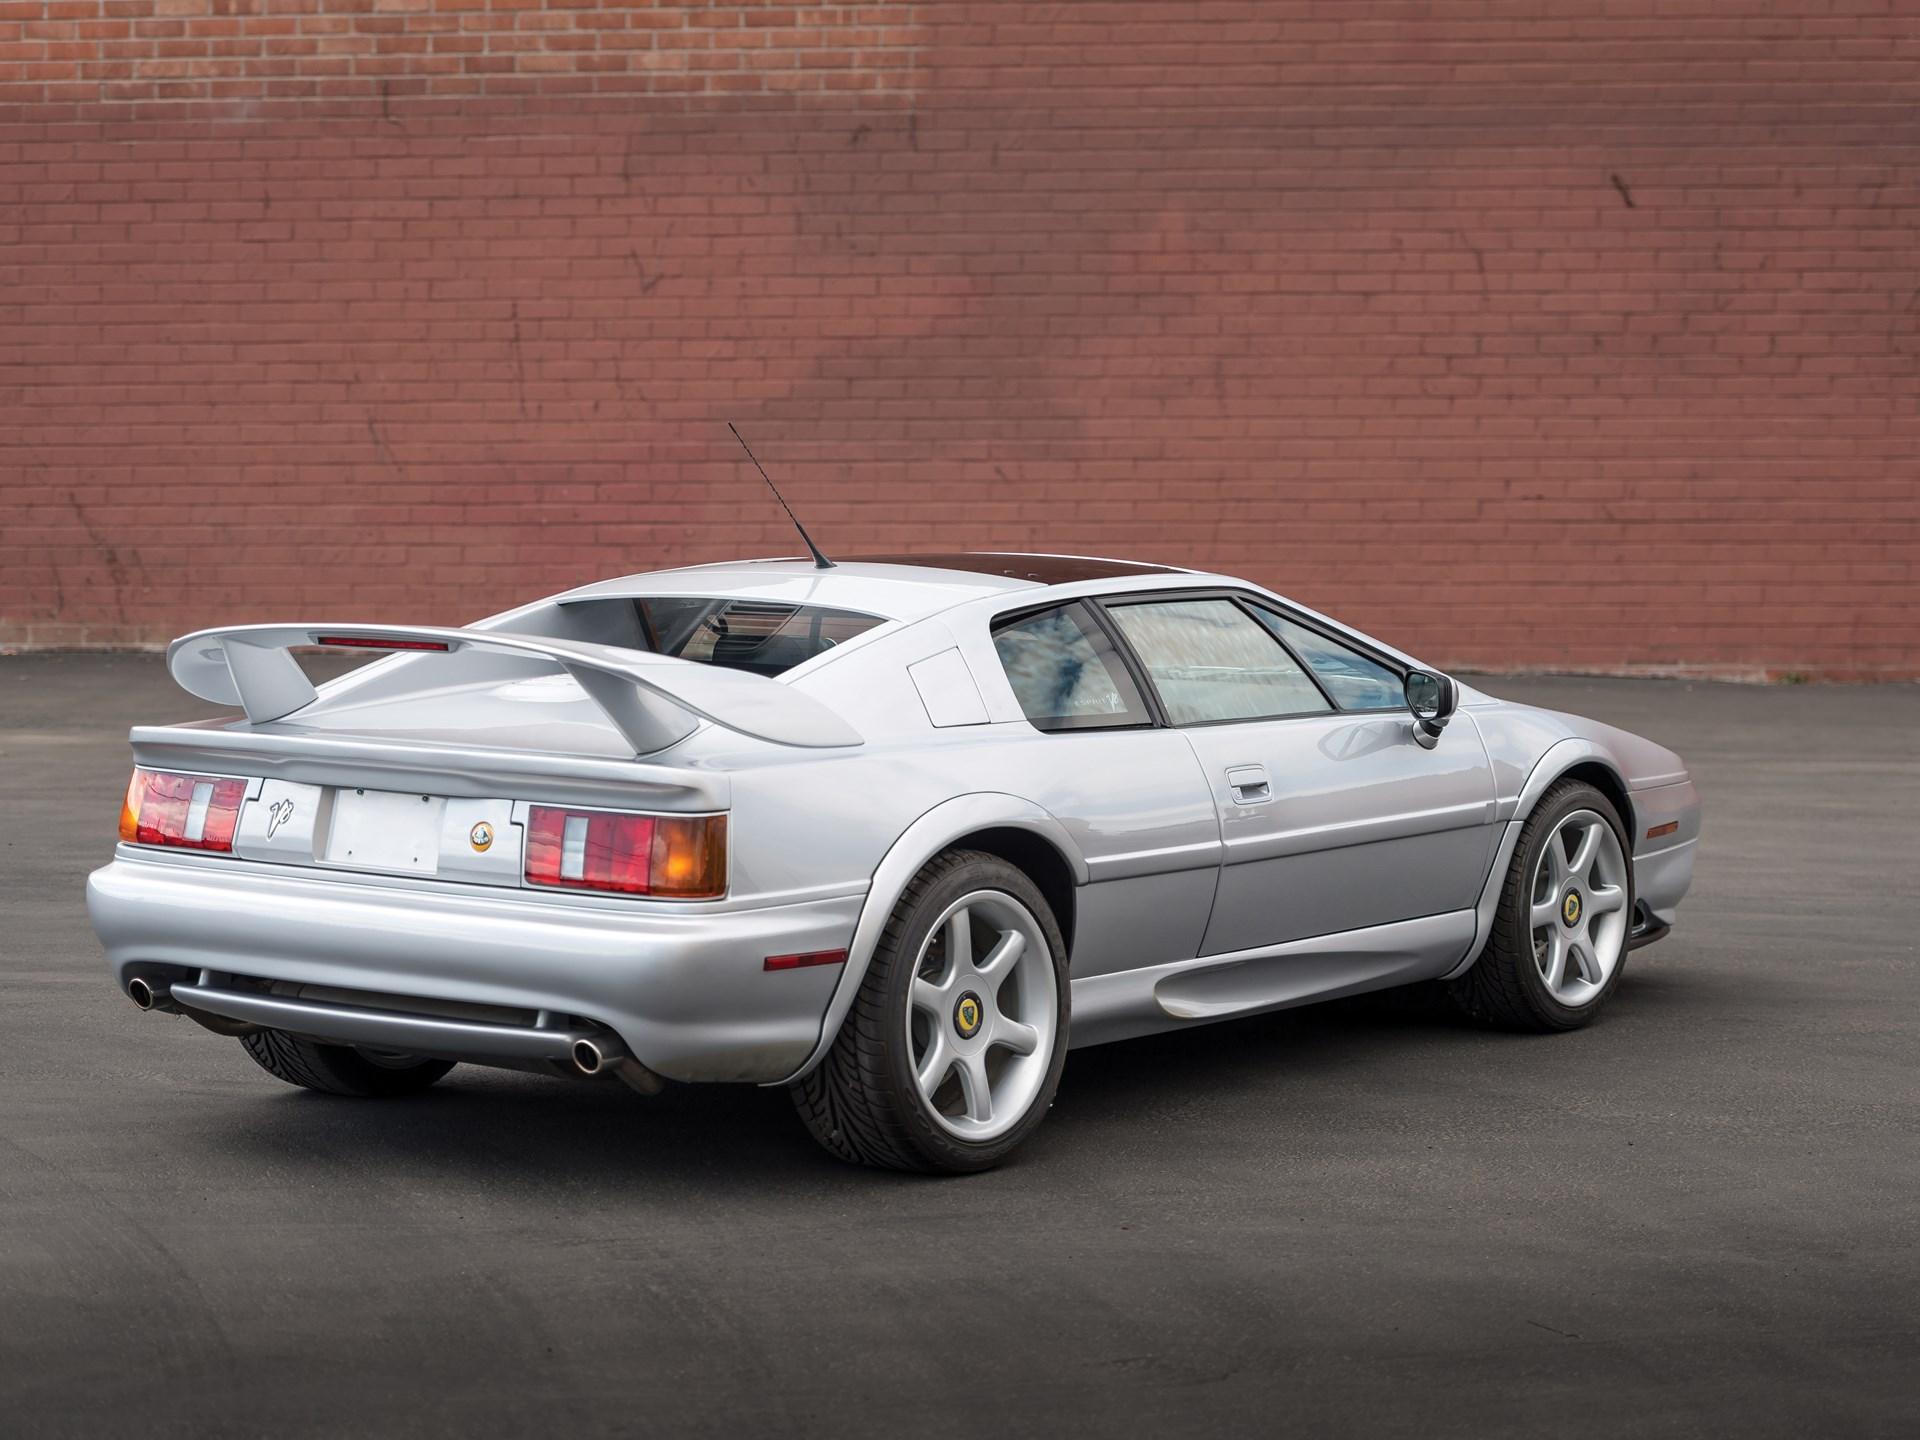 56f095f62caa RM Sotheby s - 2000 Lotus Esprit V8 SE